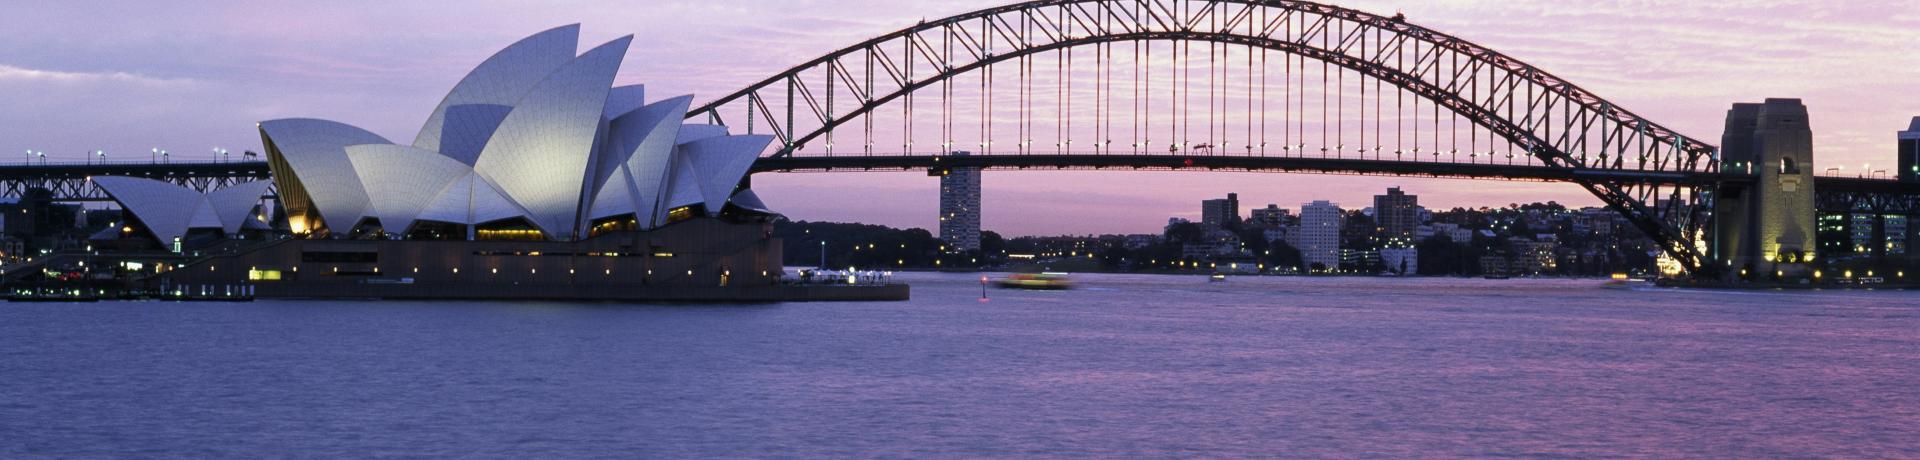 188182+Australien+Sydney+Sydney_Opera_House+TS_72969807.jpg